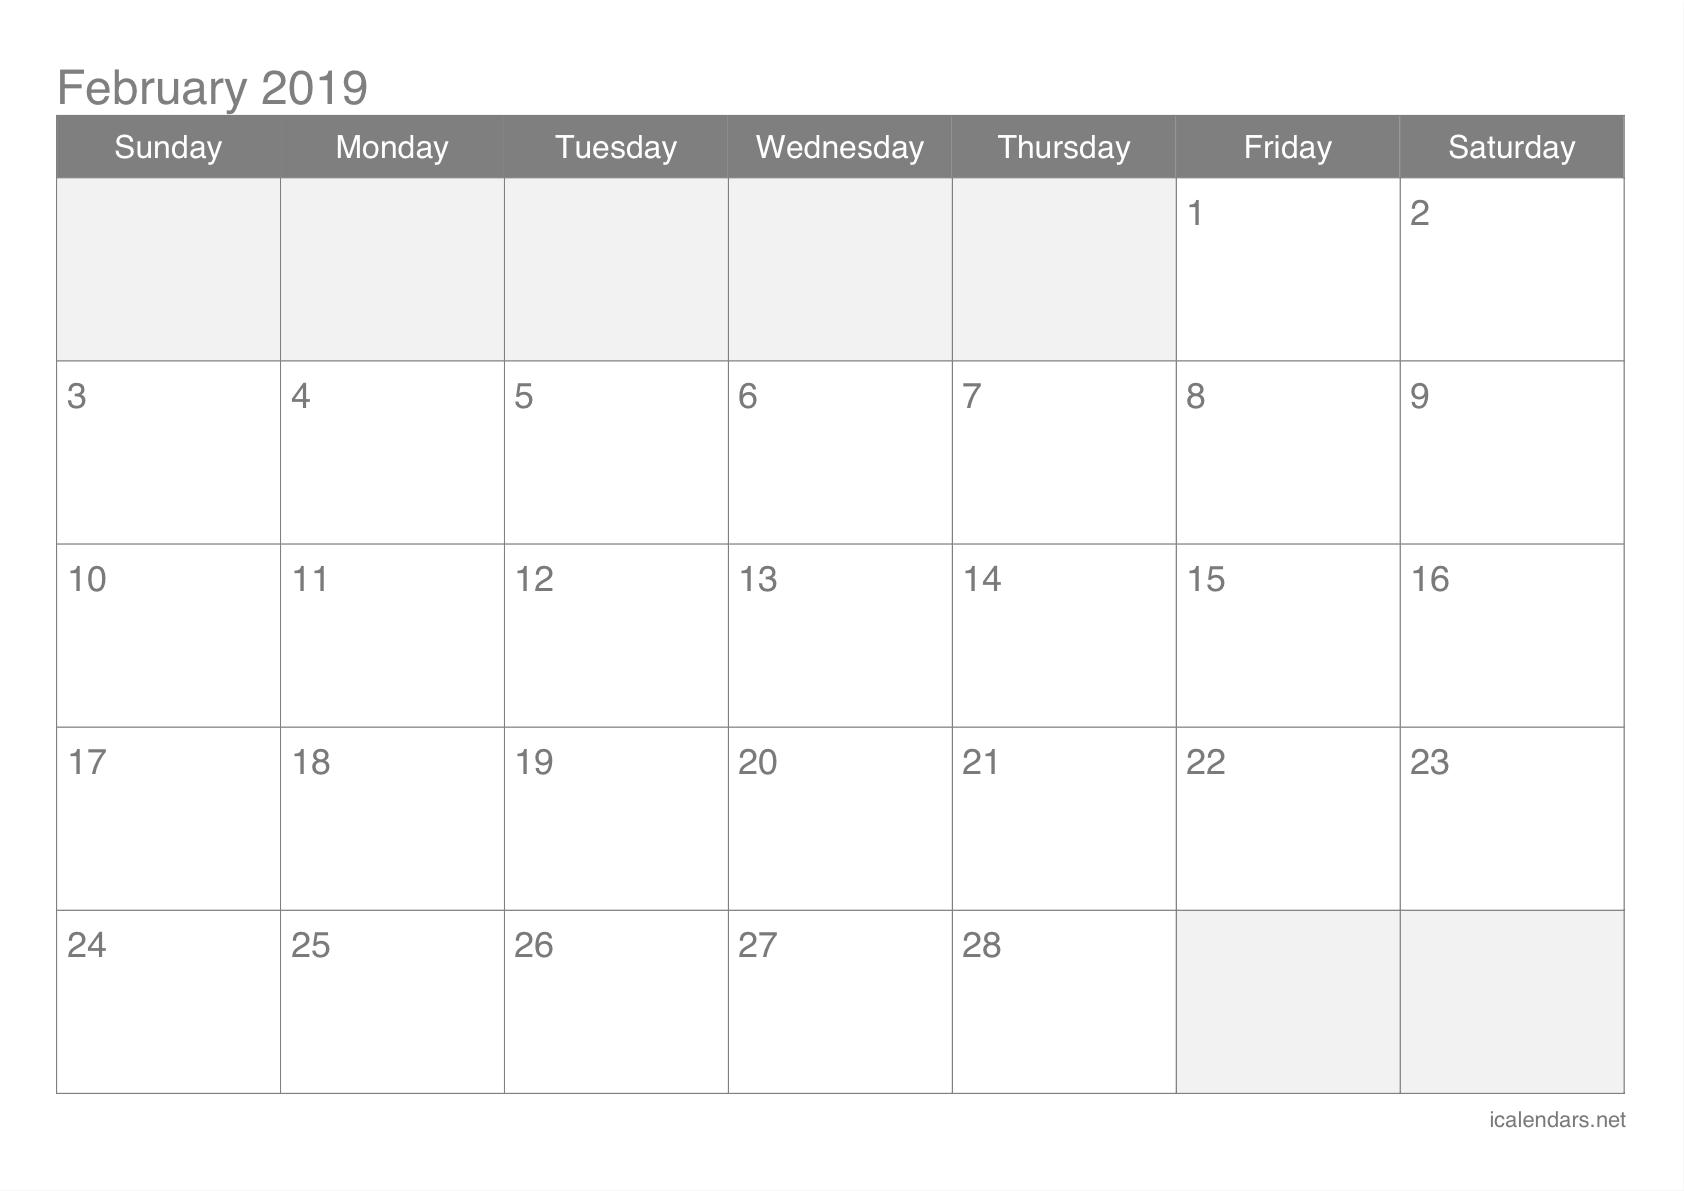 February 2019 Calendar Free Printable